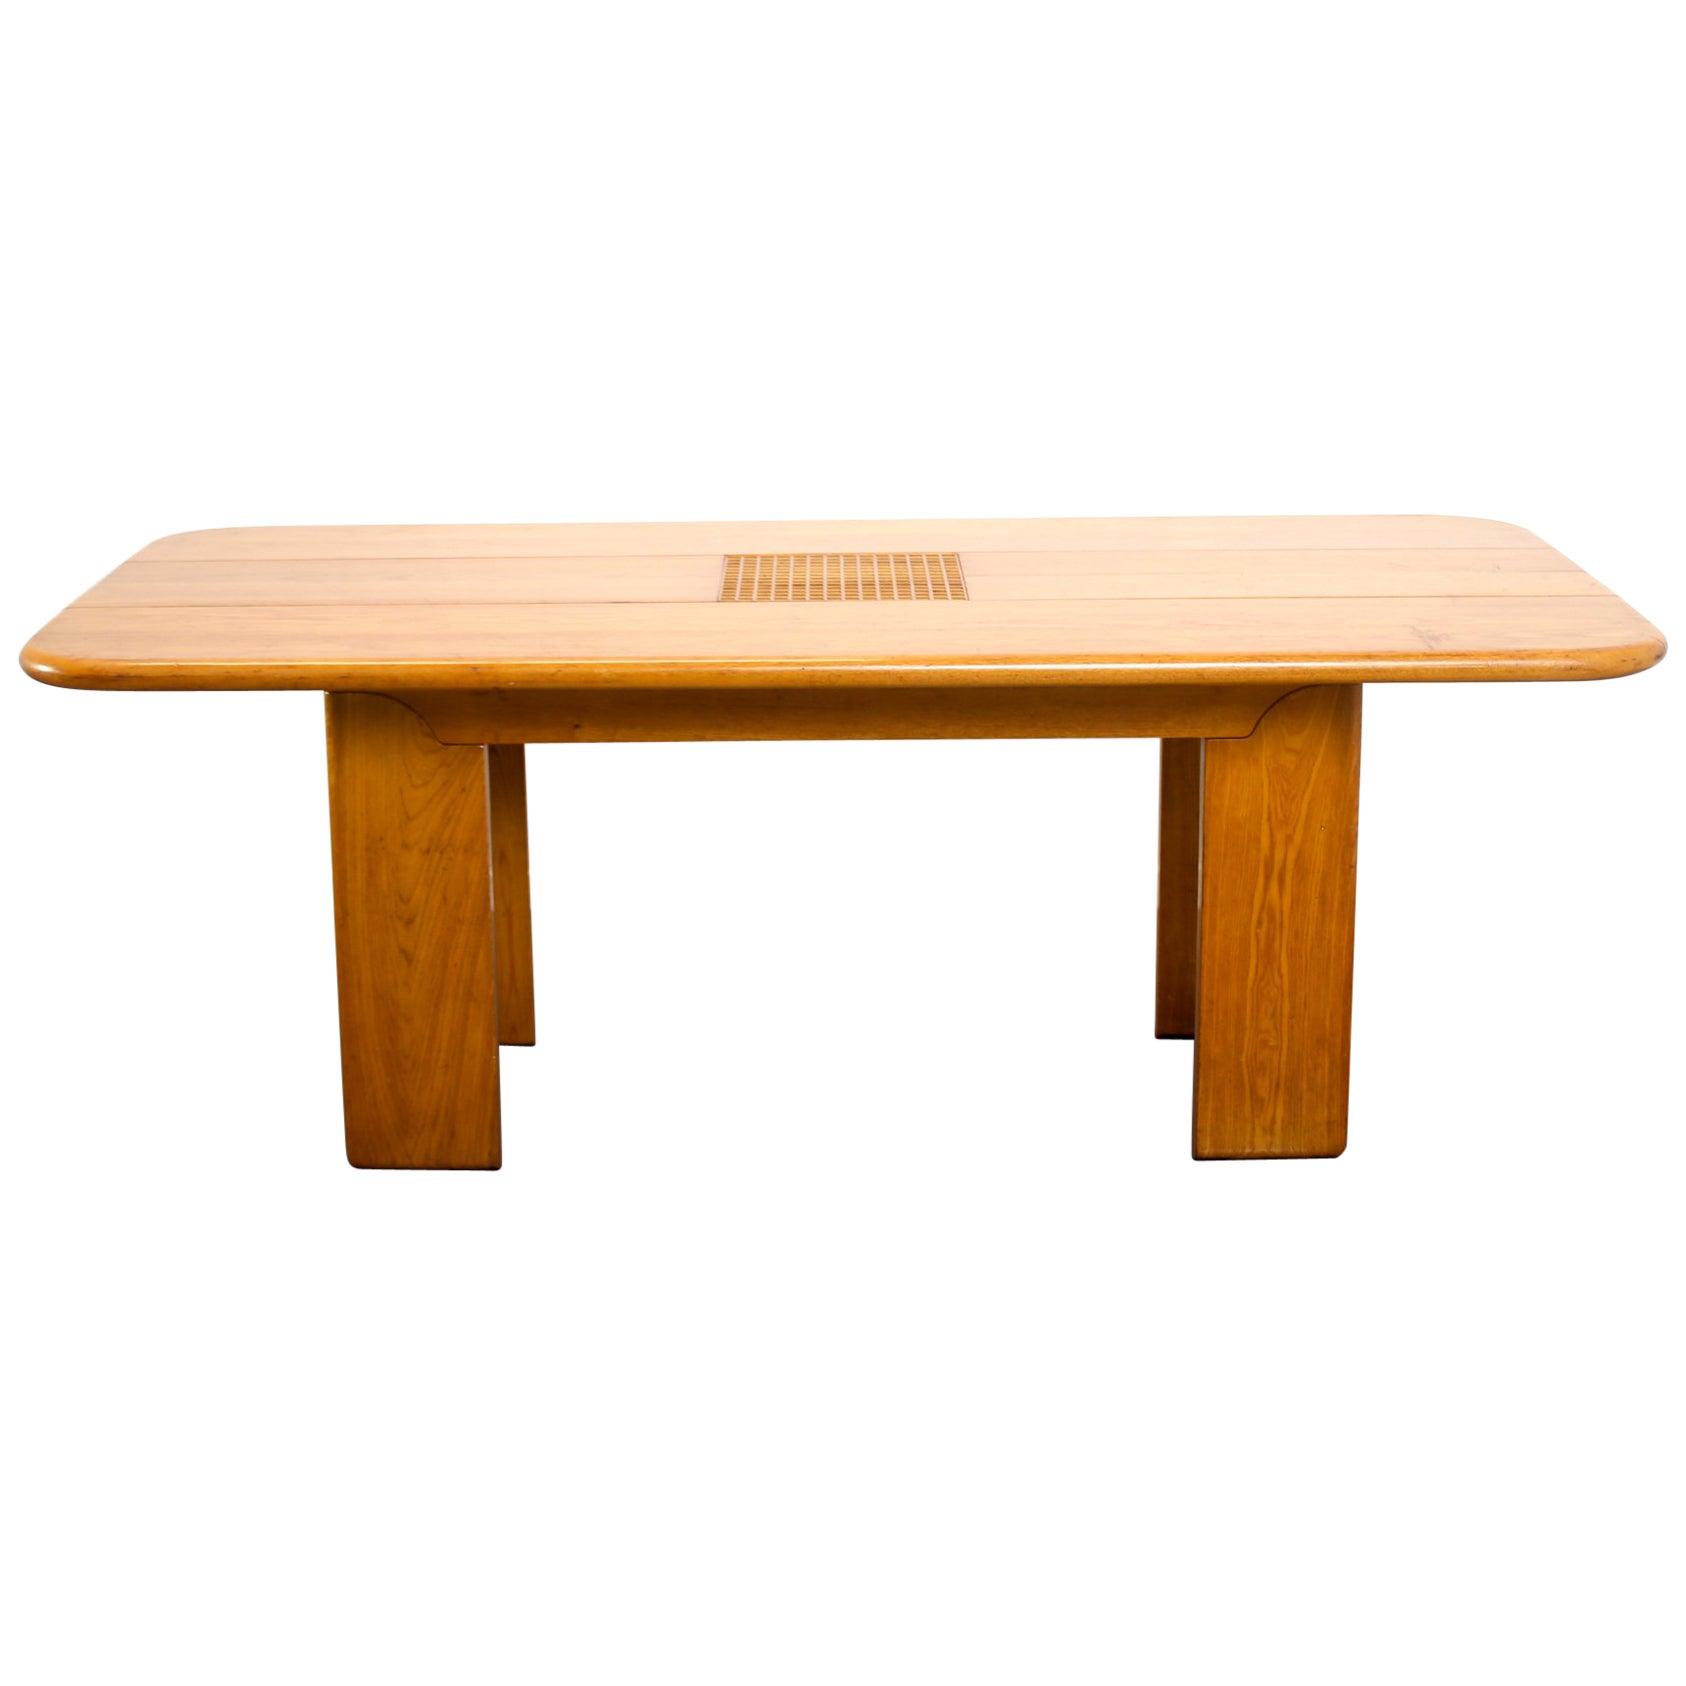 Mid century Modern Blonde Walnut Timber Italian Dining Table, 1970